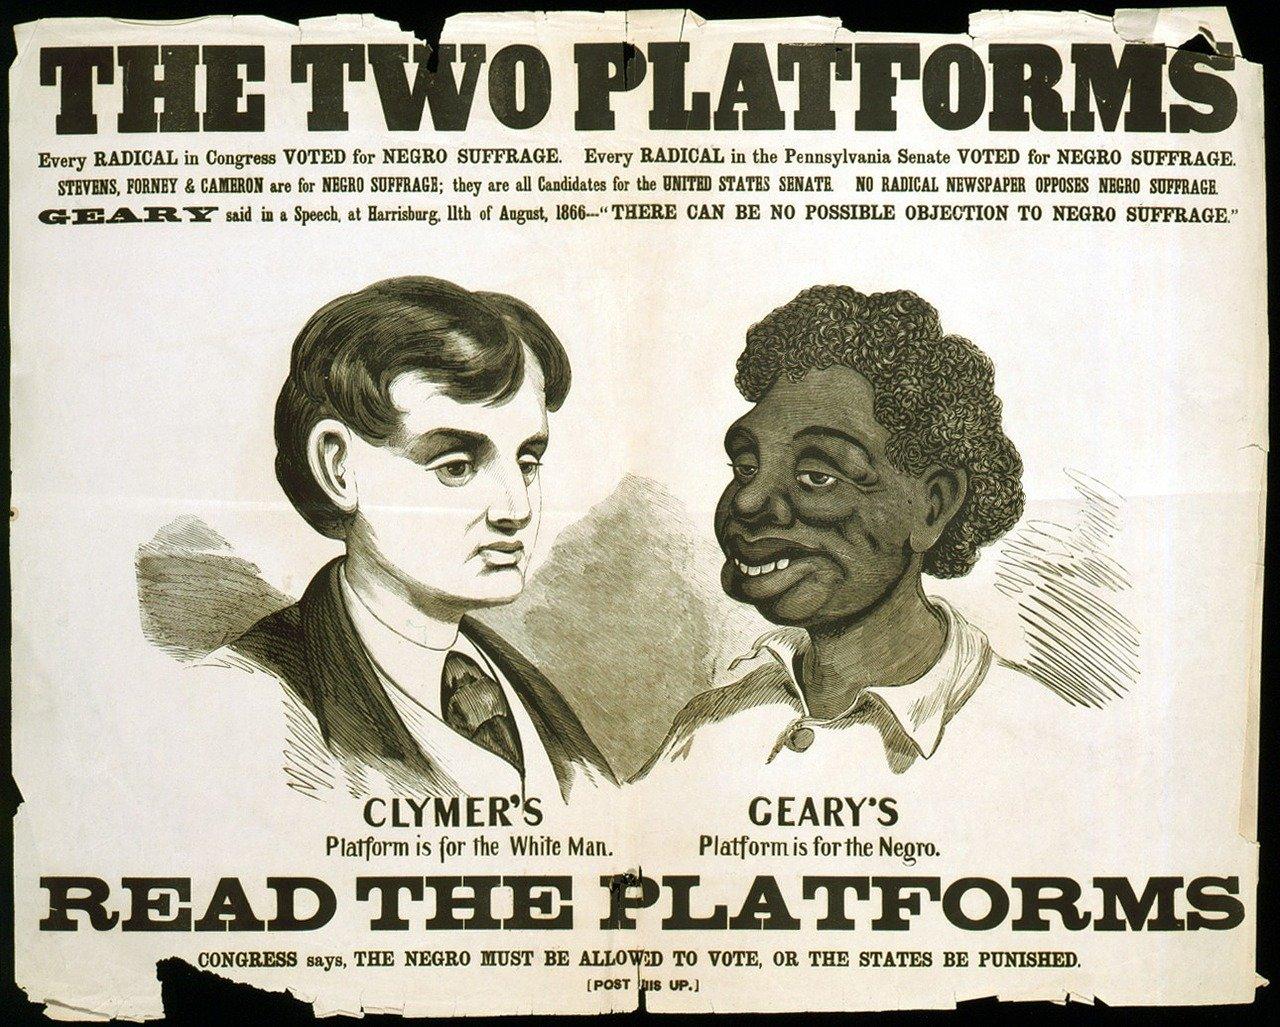 1618376519-racial-segregation-67788-1280.jpeg